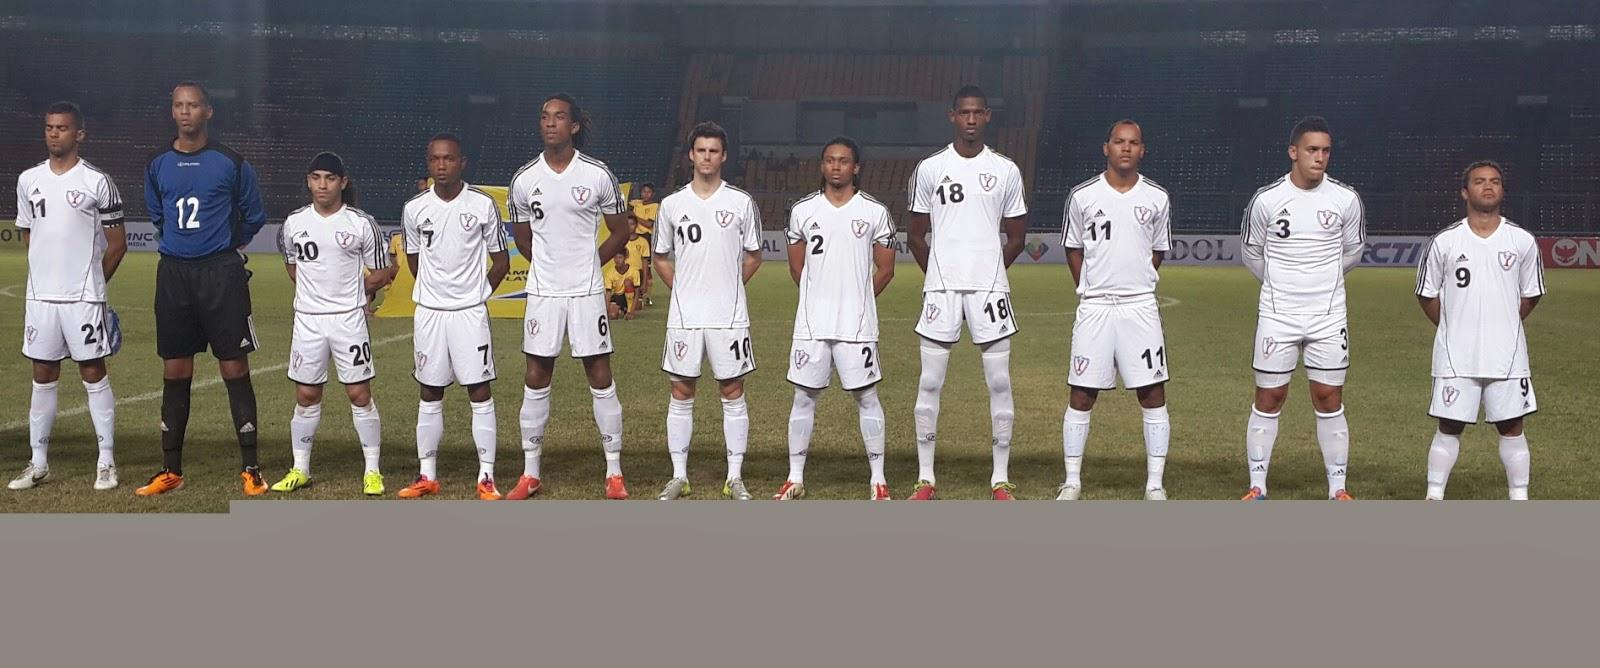 RD empata 1-1 en Indonesia